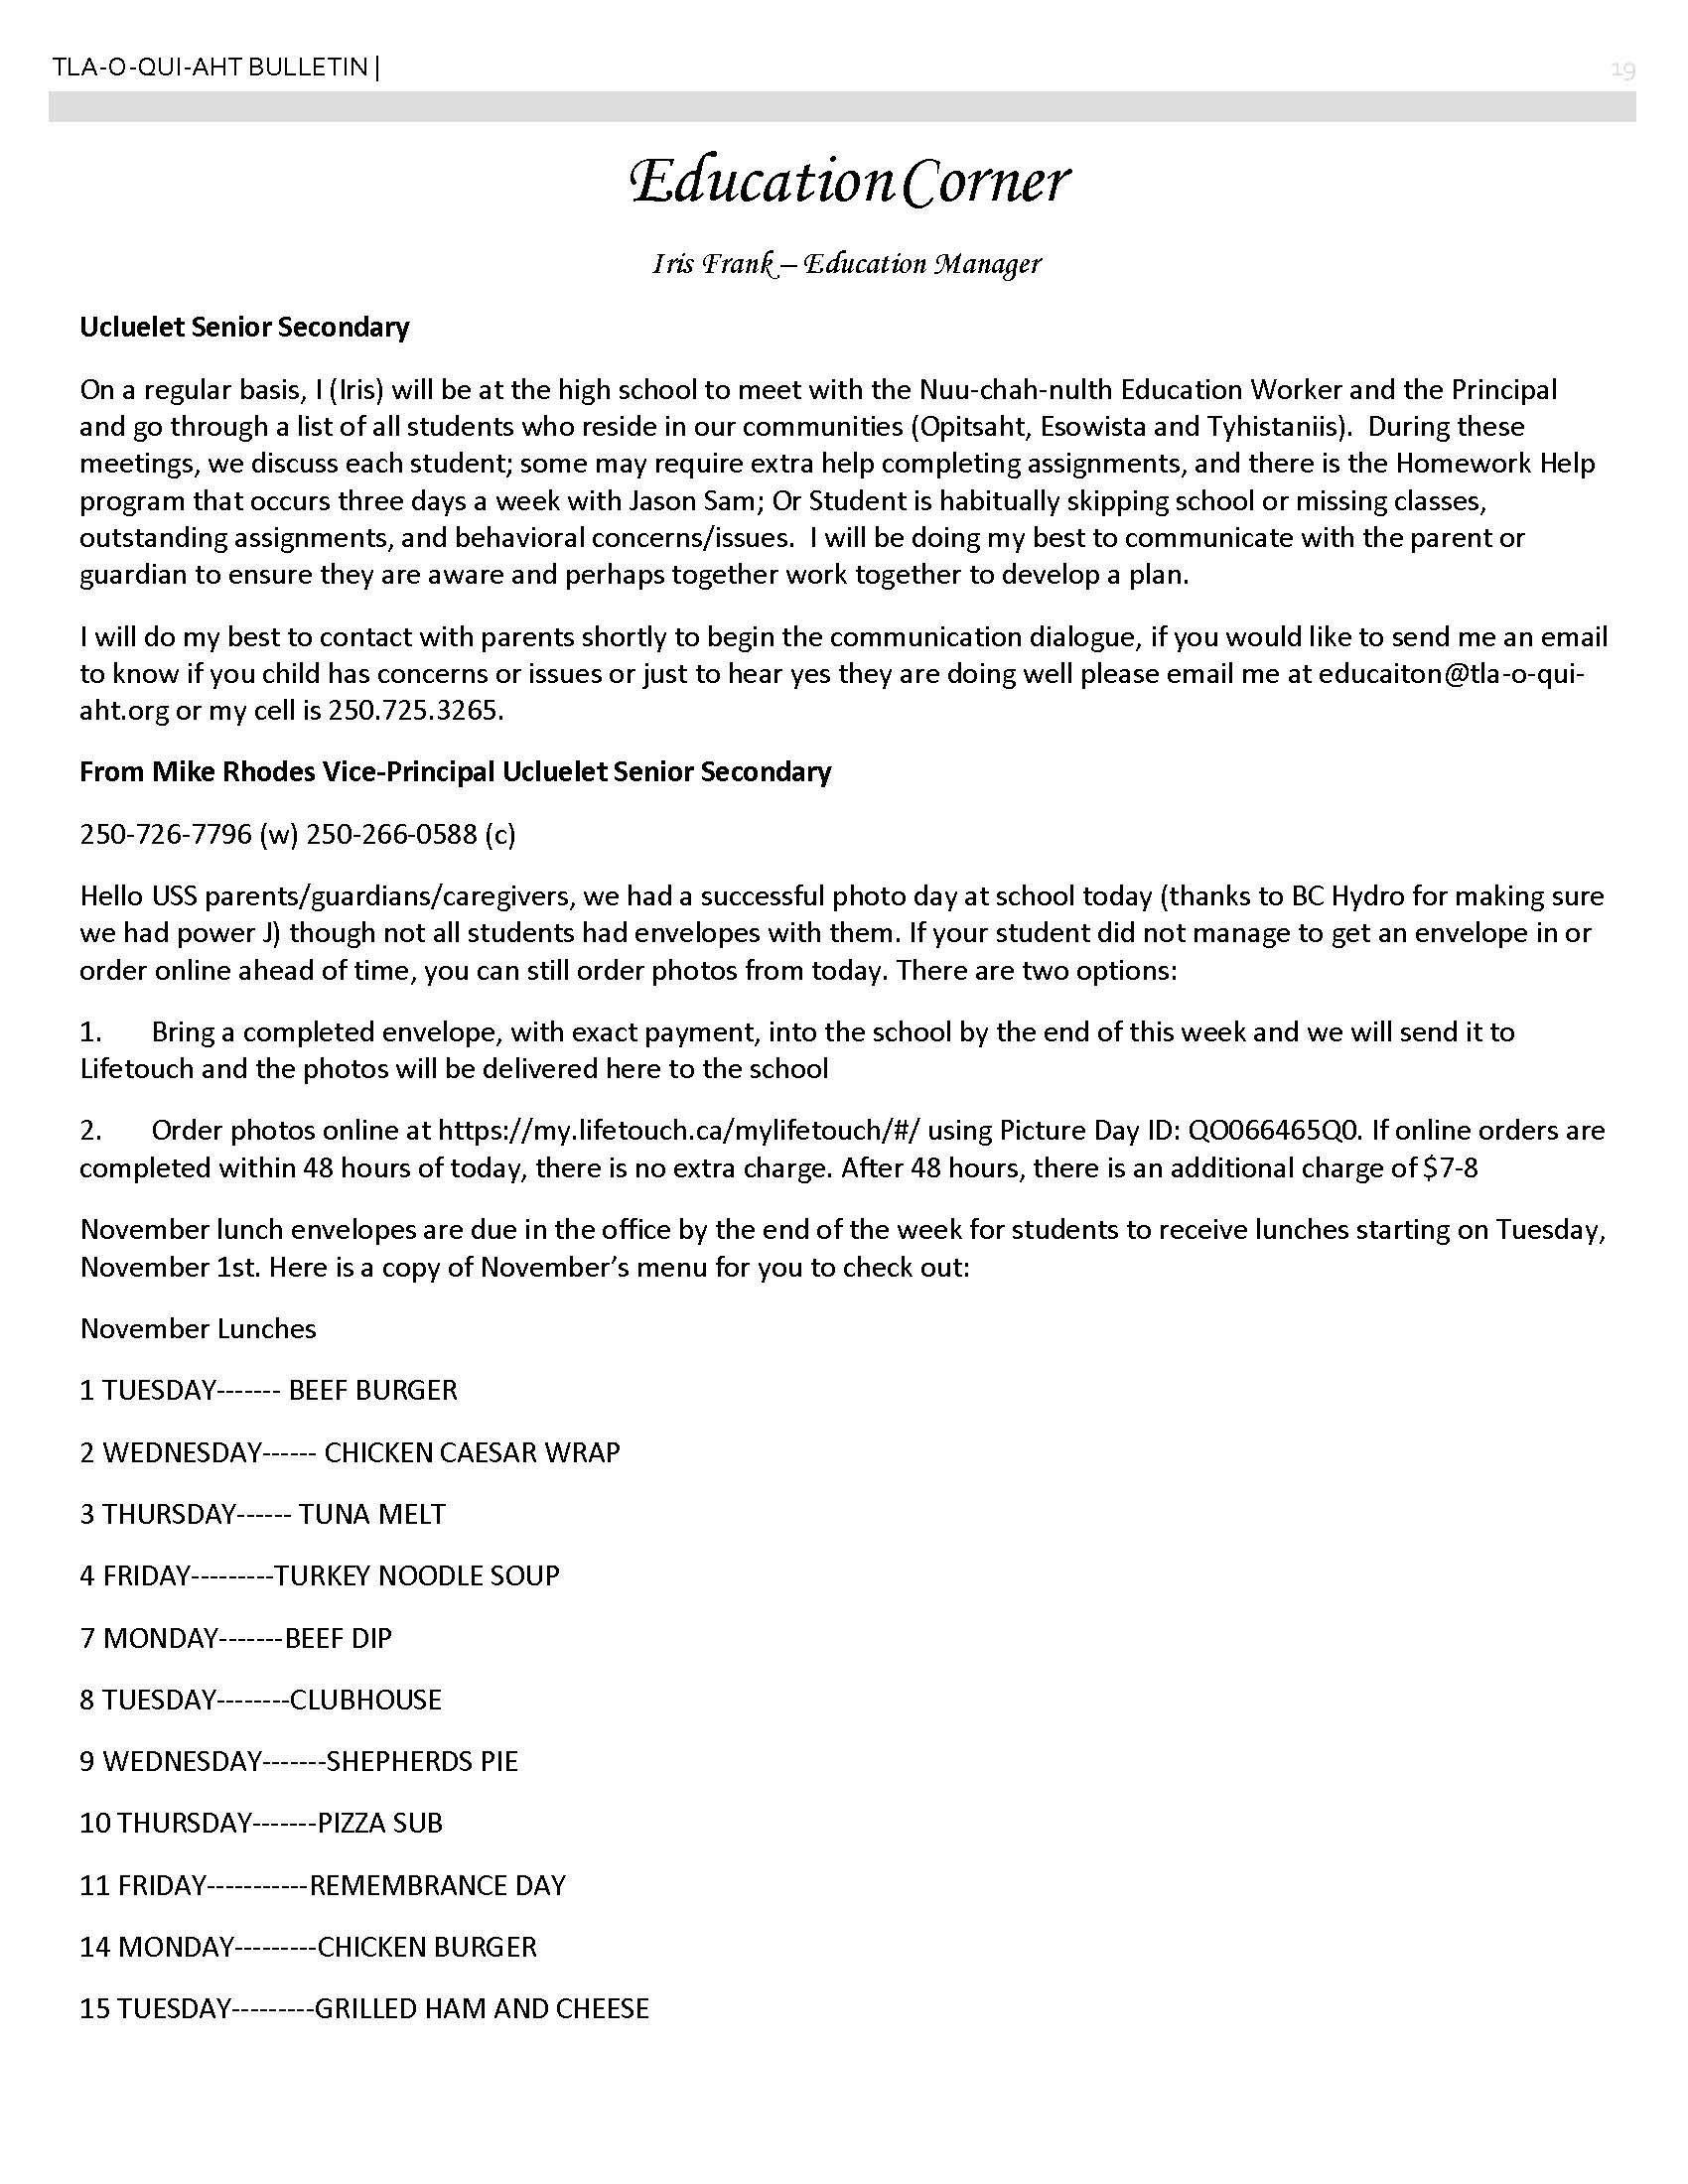 TFN Bulletin Nov 1st 2016_Page_19.jpg